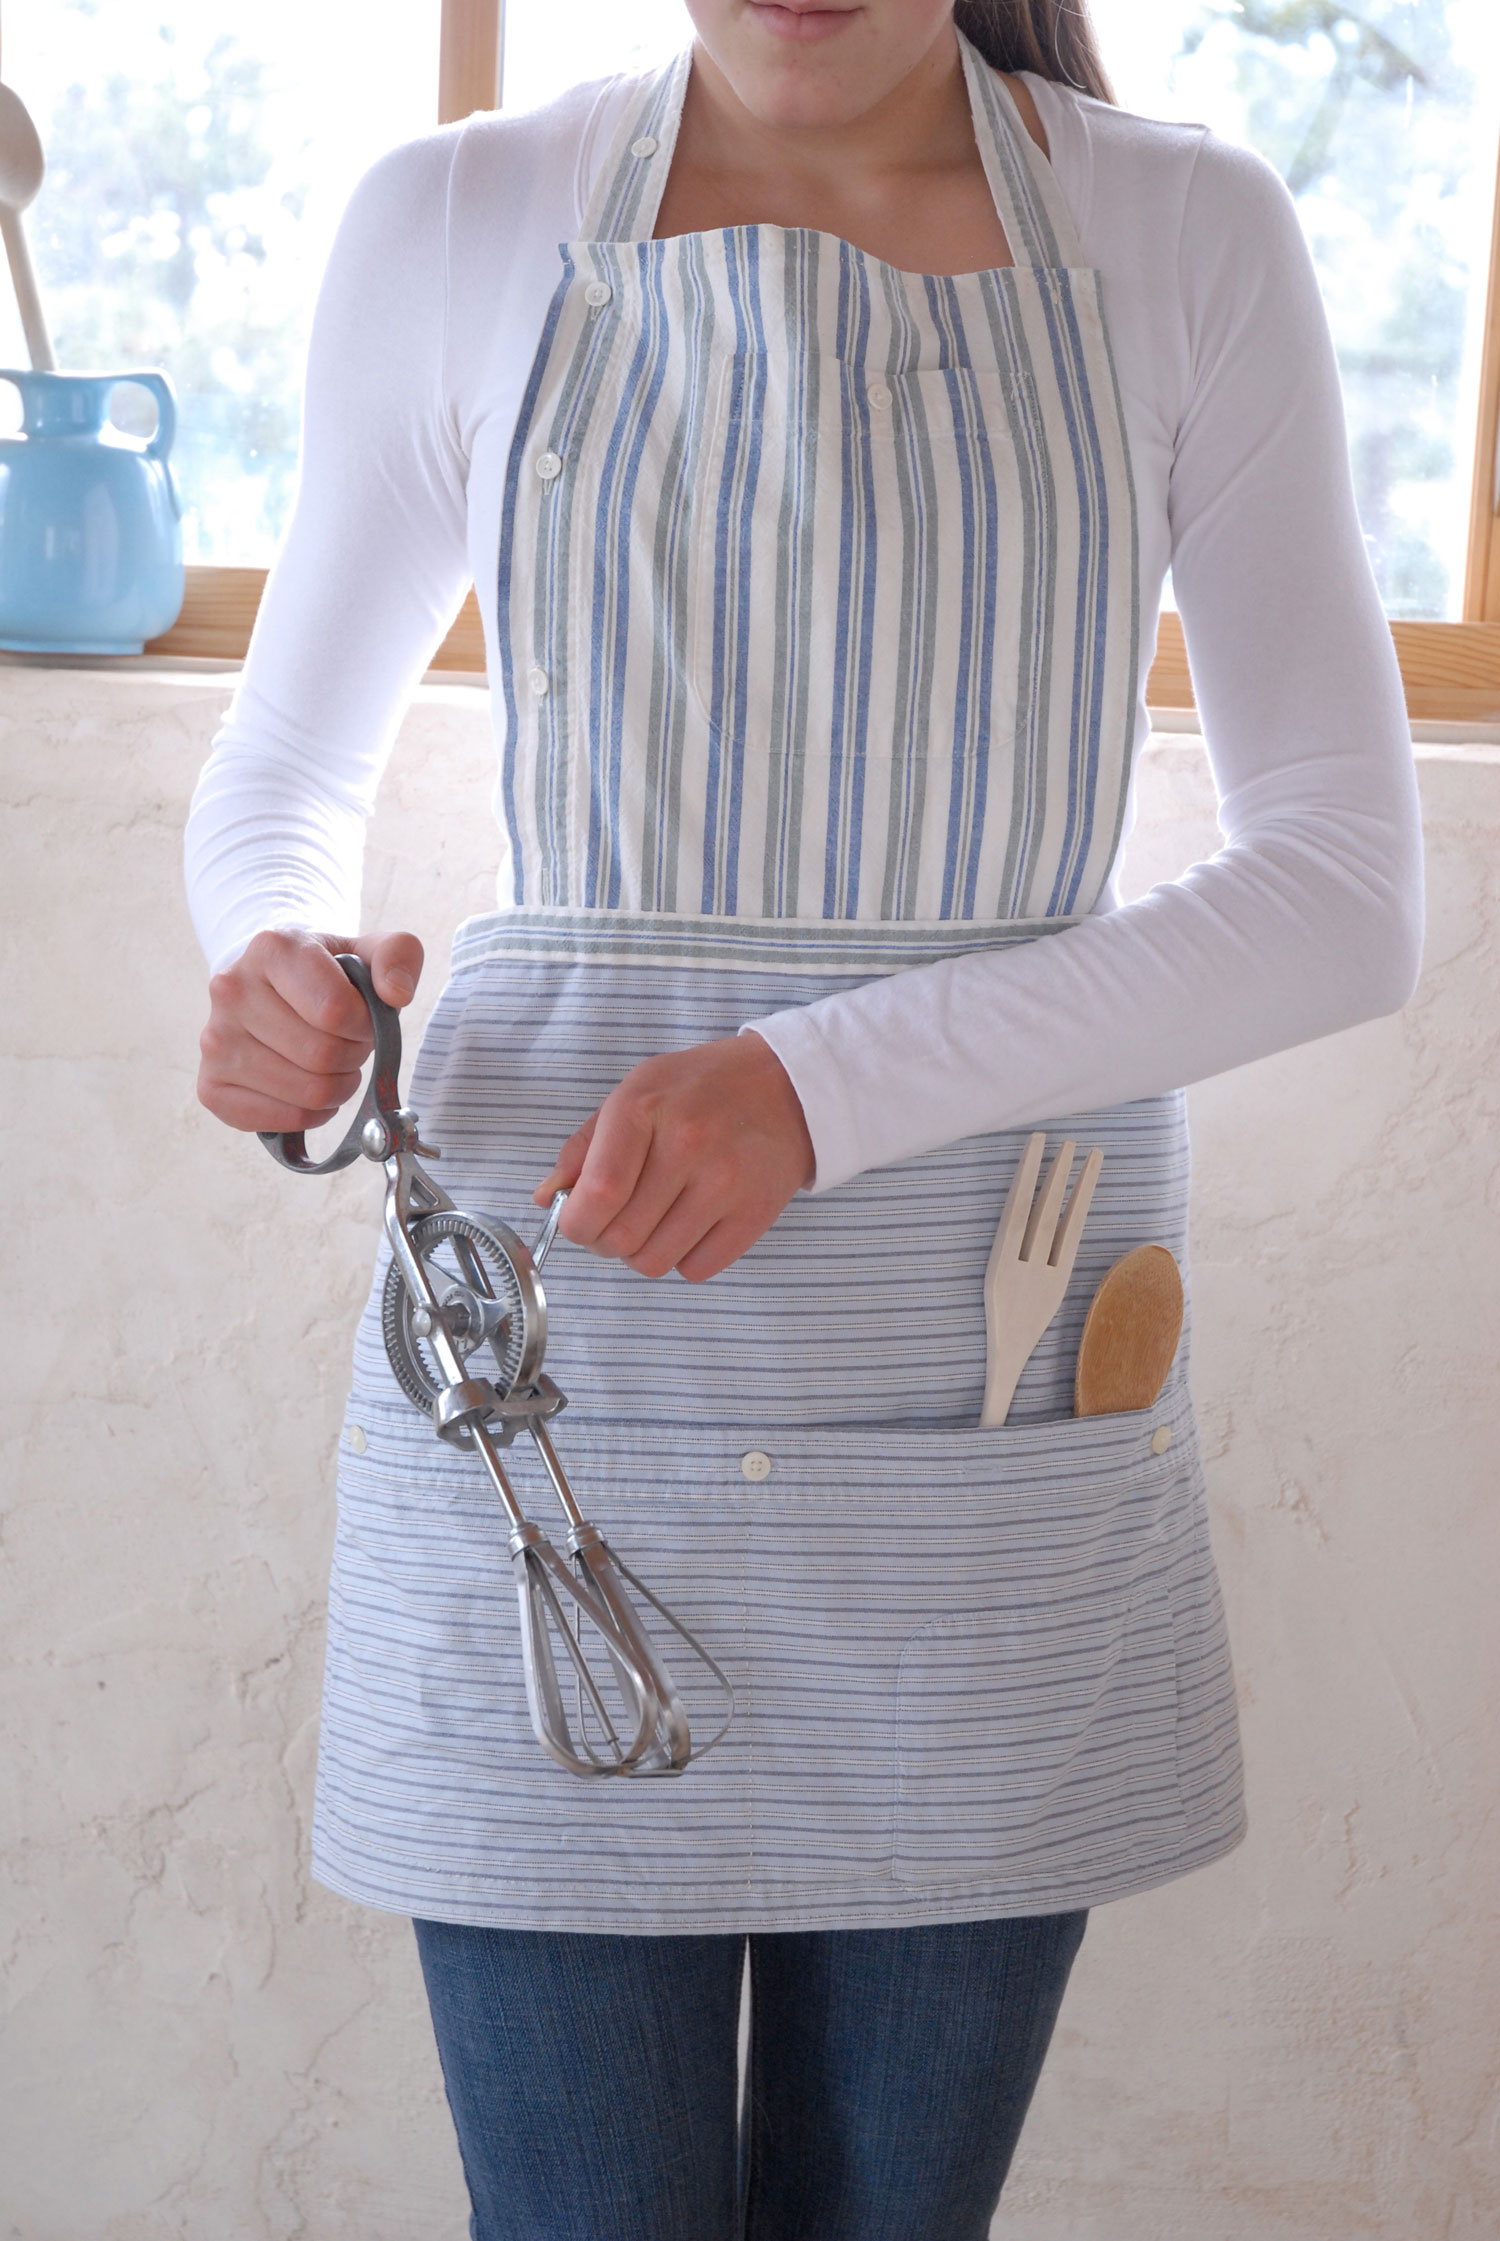 DSC_0042-excellent-full-on-cam-apron-OP.jpg